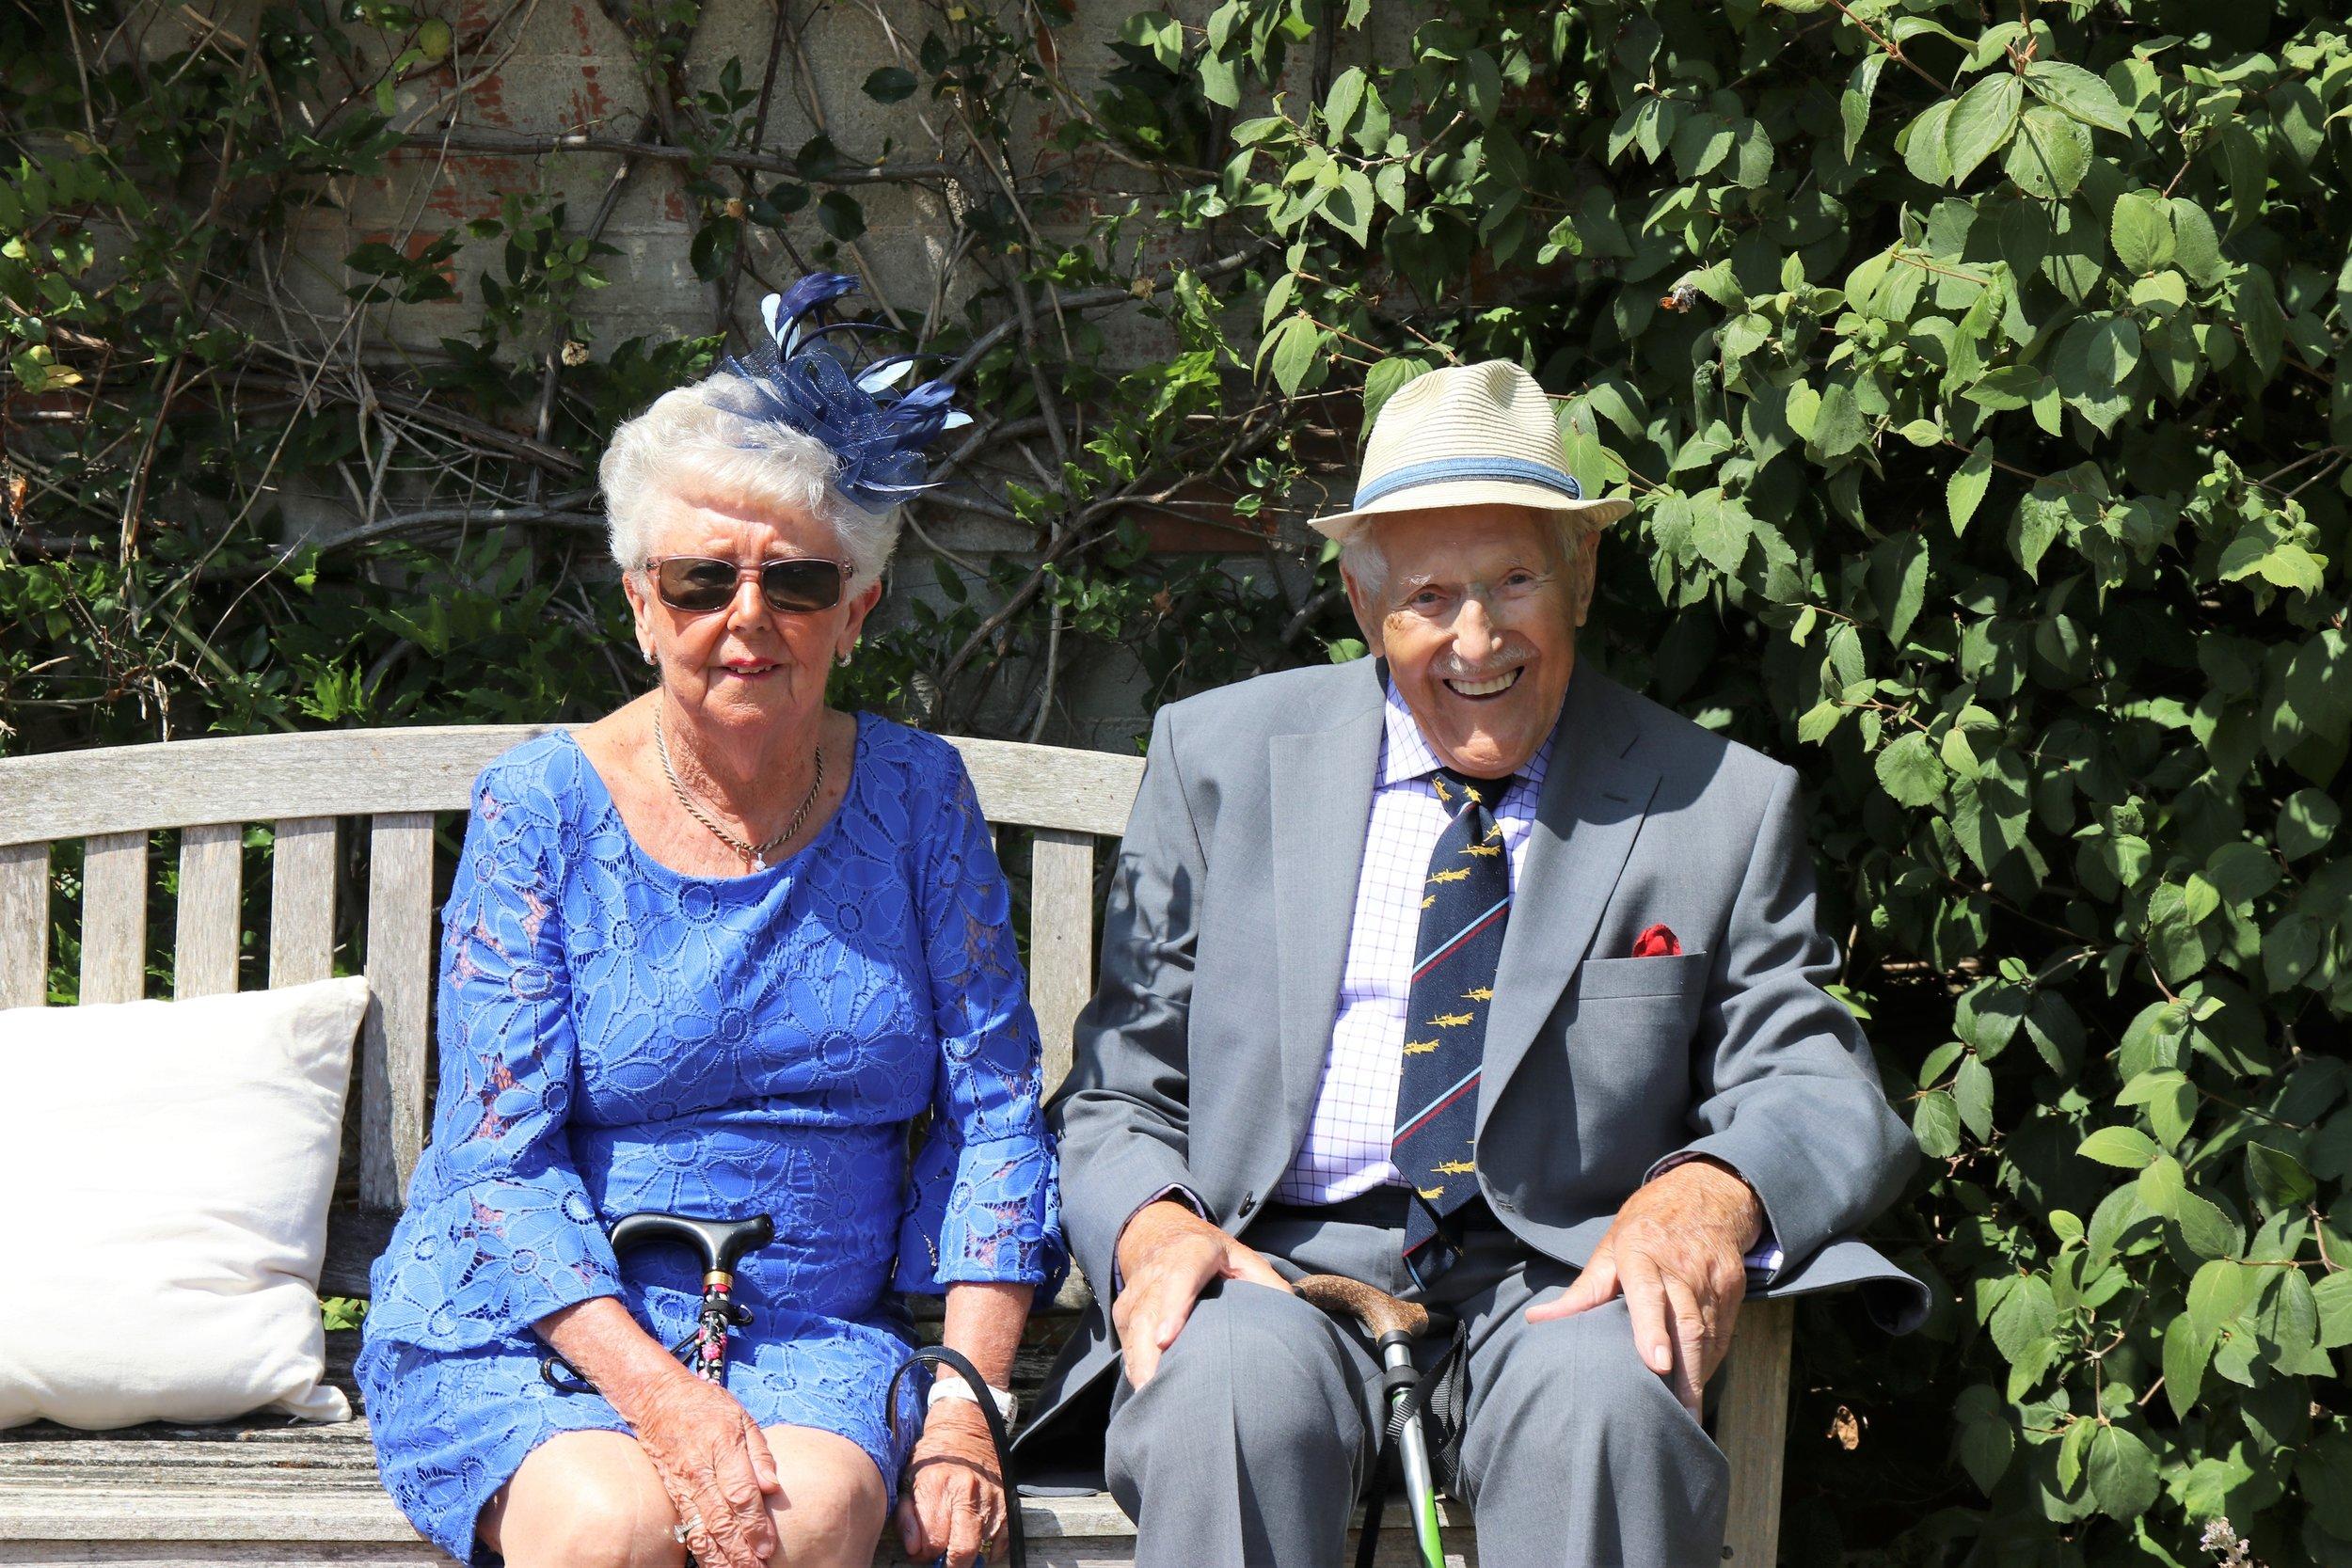 adult-couple-elderly-1243332.jpg